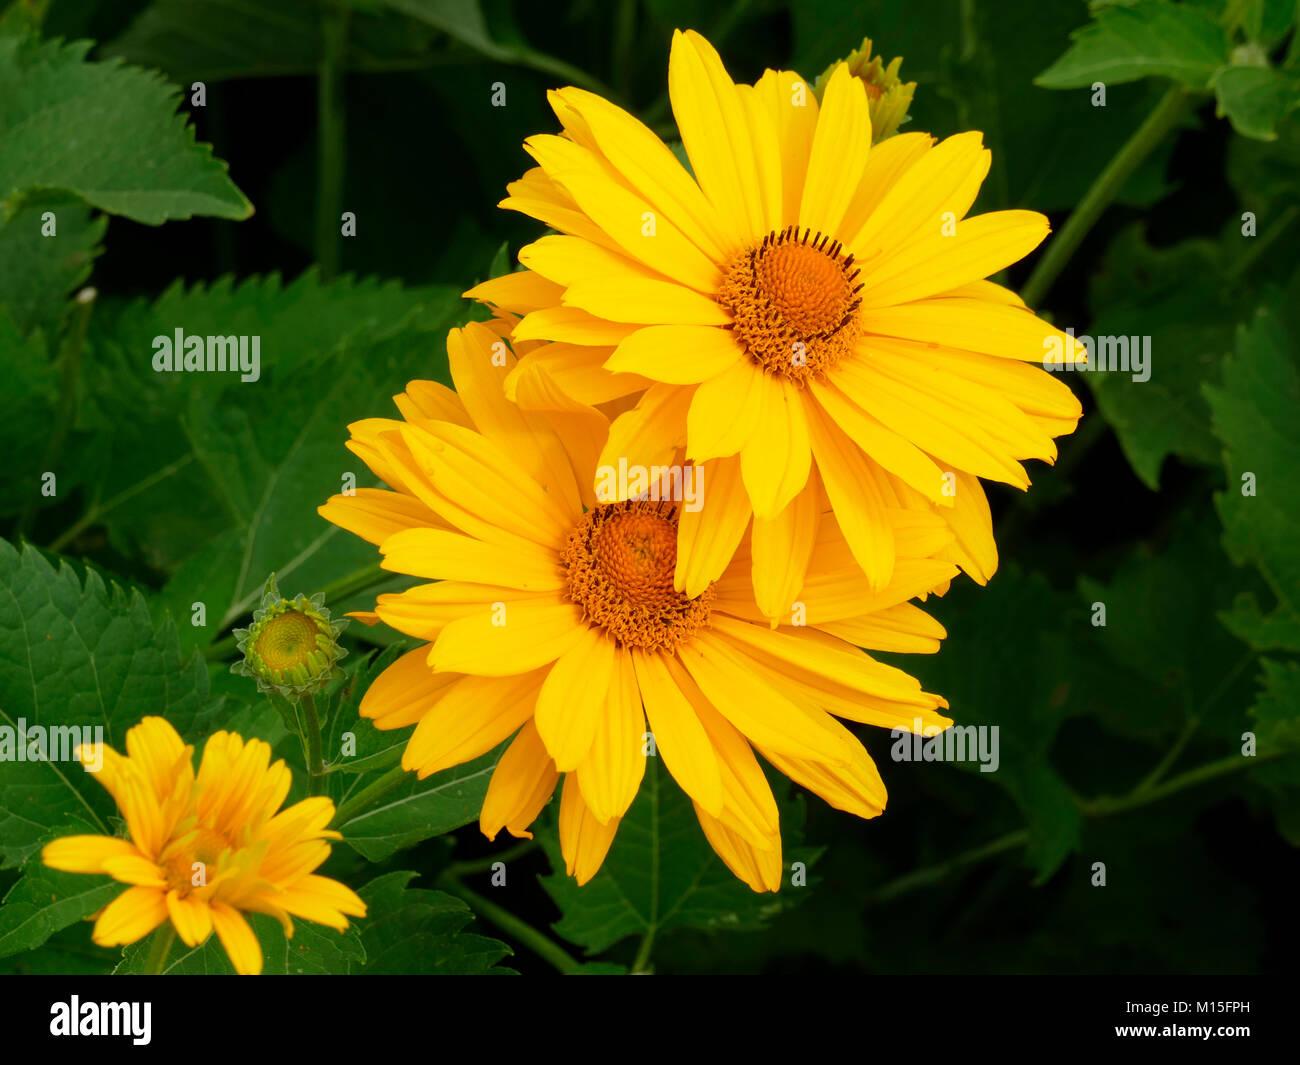 Bunch of Yellow Blanket Flowers in a Garden Stock Photo